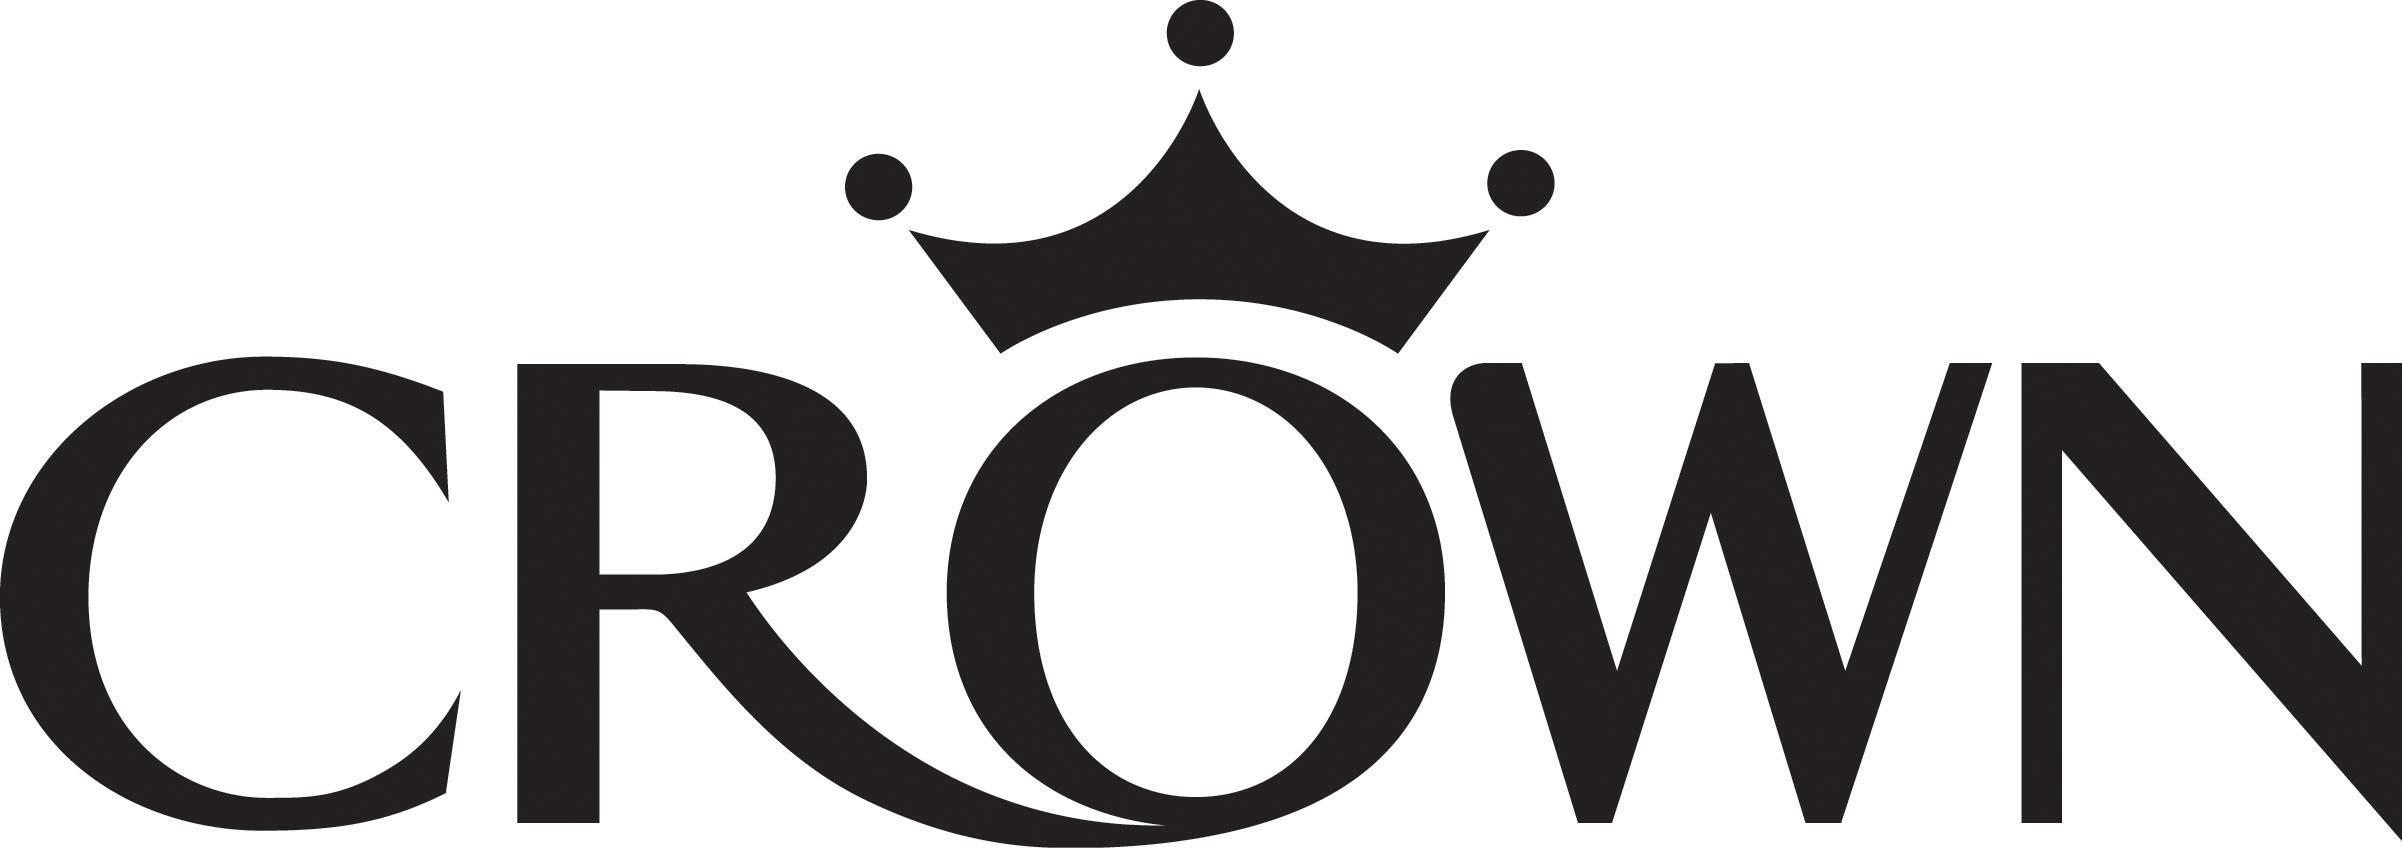 crown logo rgb.jpg